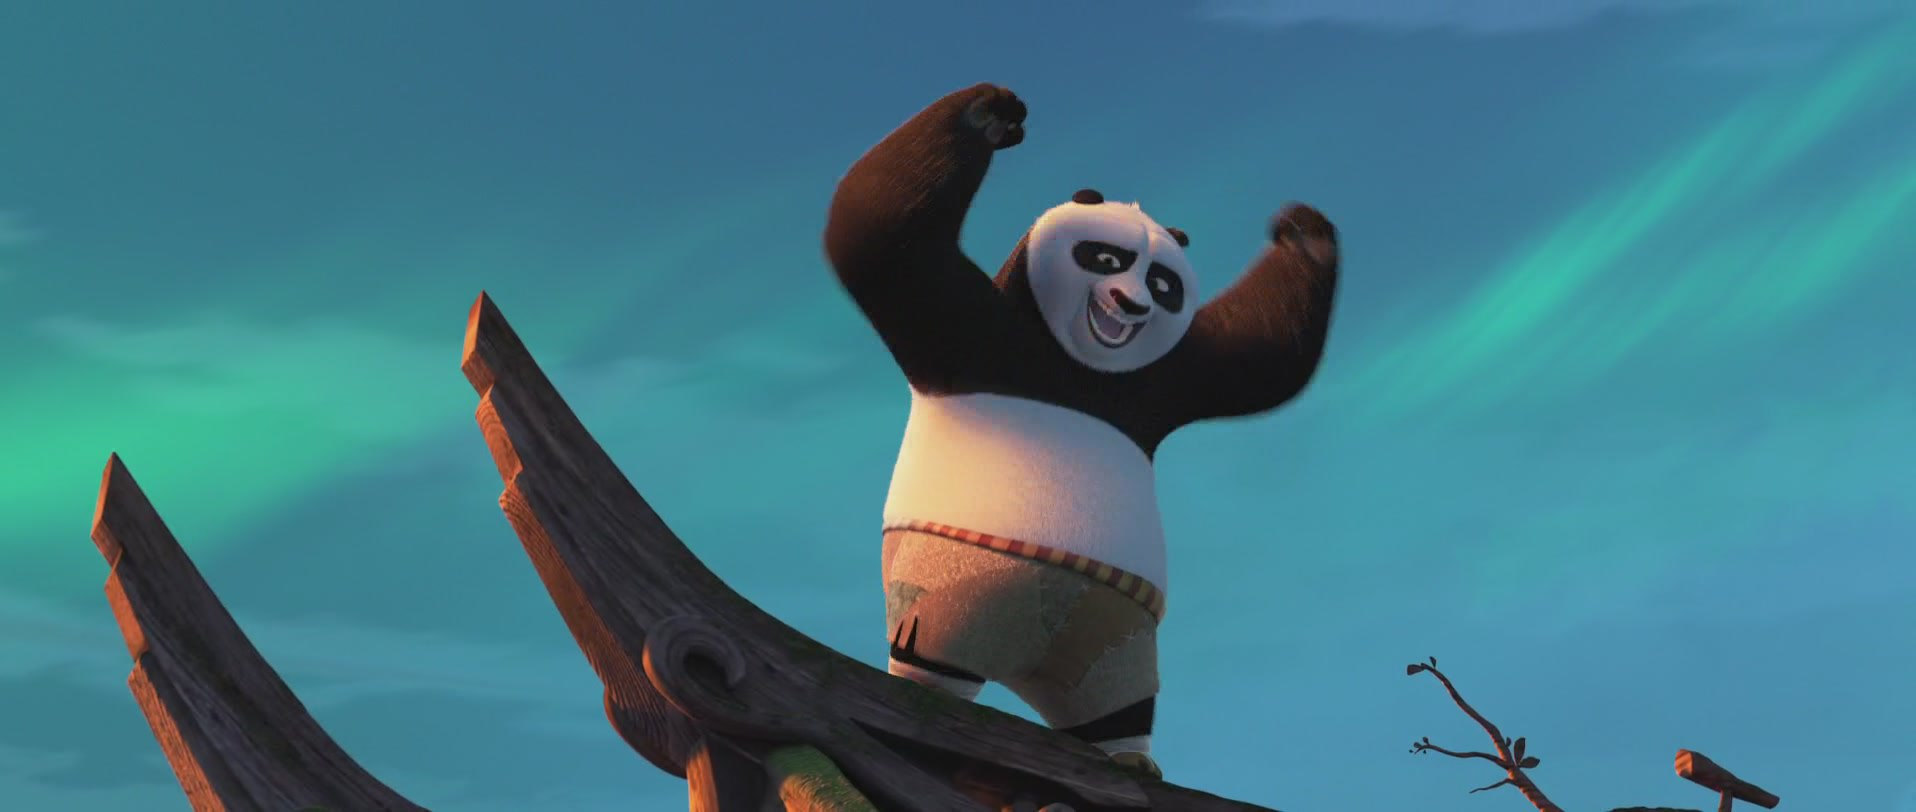 картинка с мультфильма панда кунг-фу